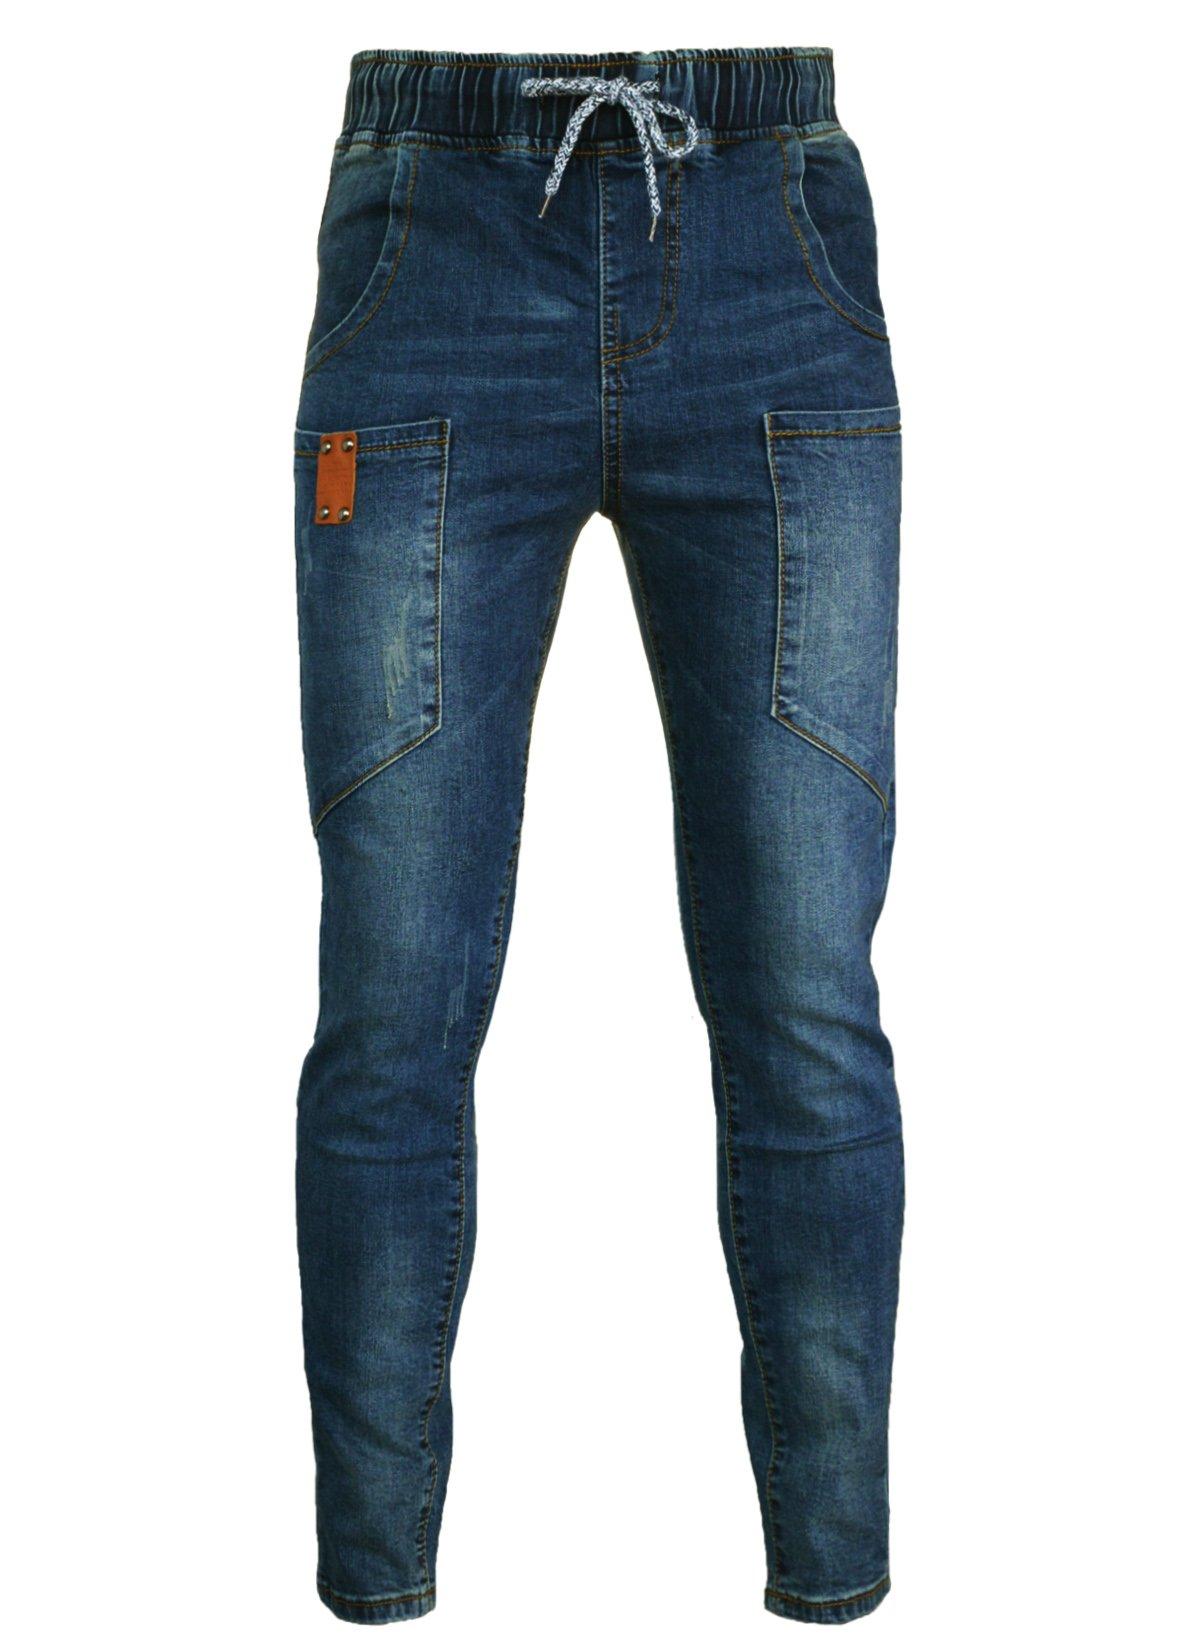 PHOENISING Women's Drawstring & Elastic Band Jeans Fashion Boyfriend Style Pants